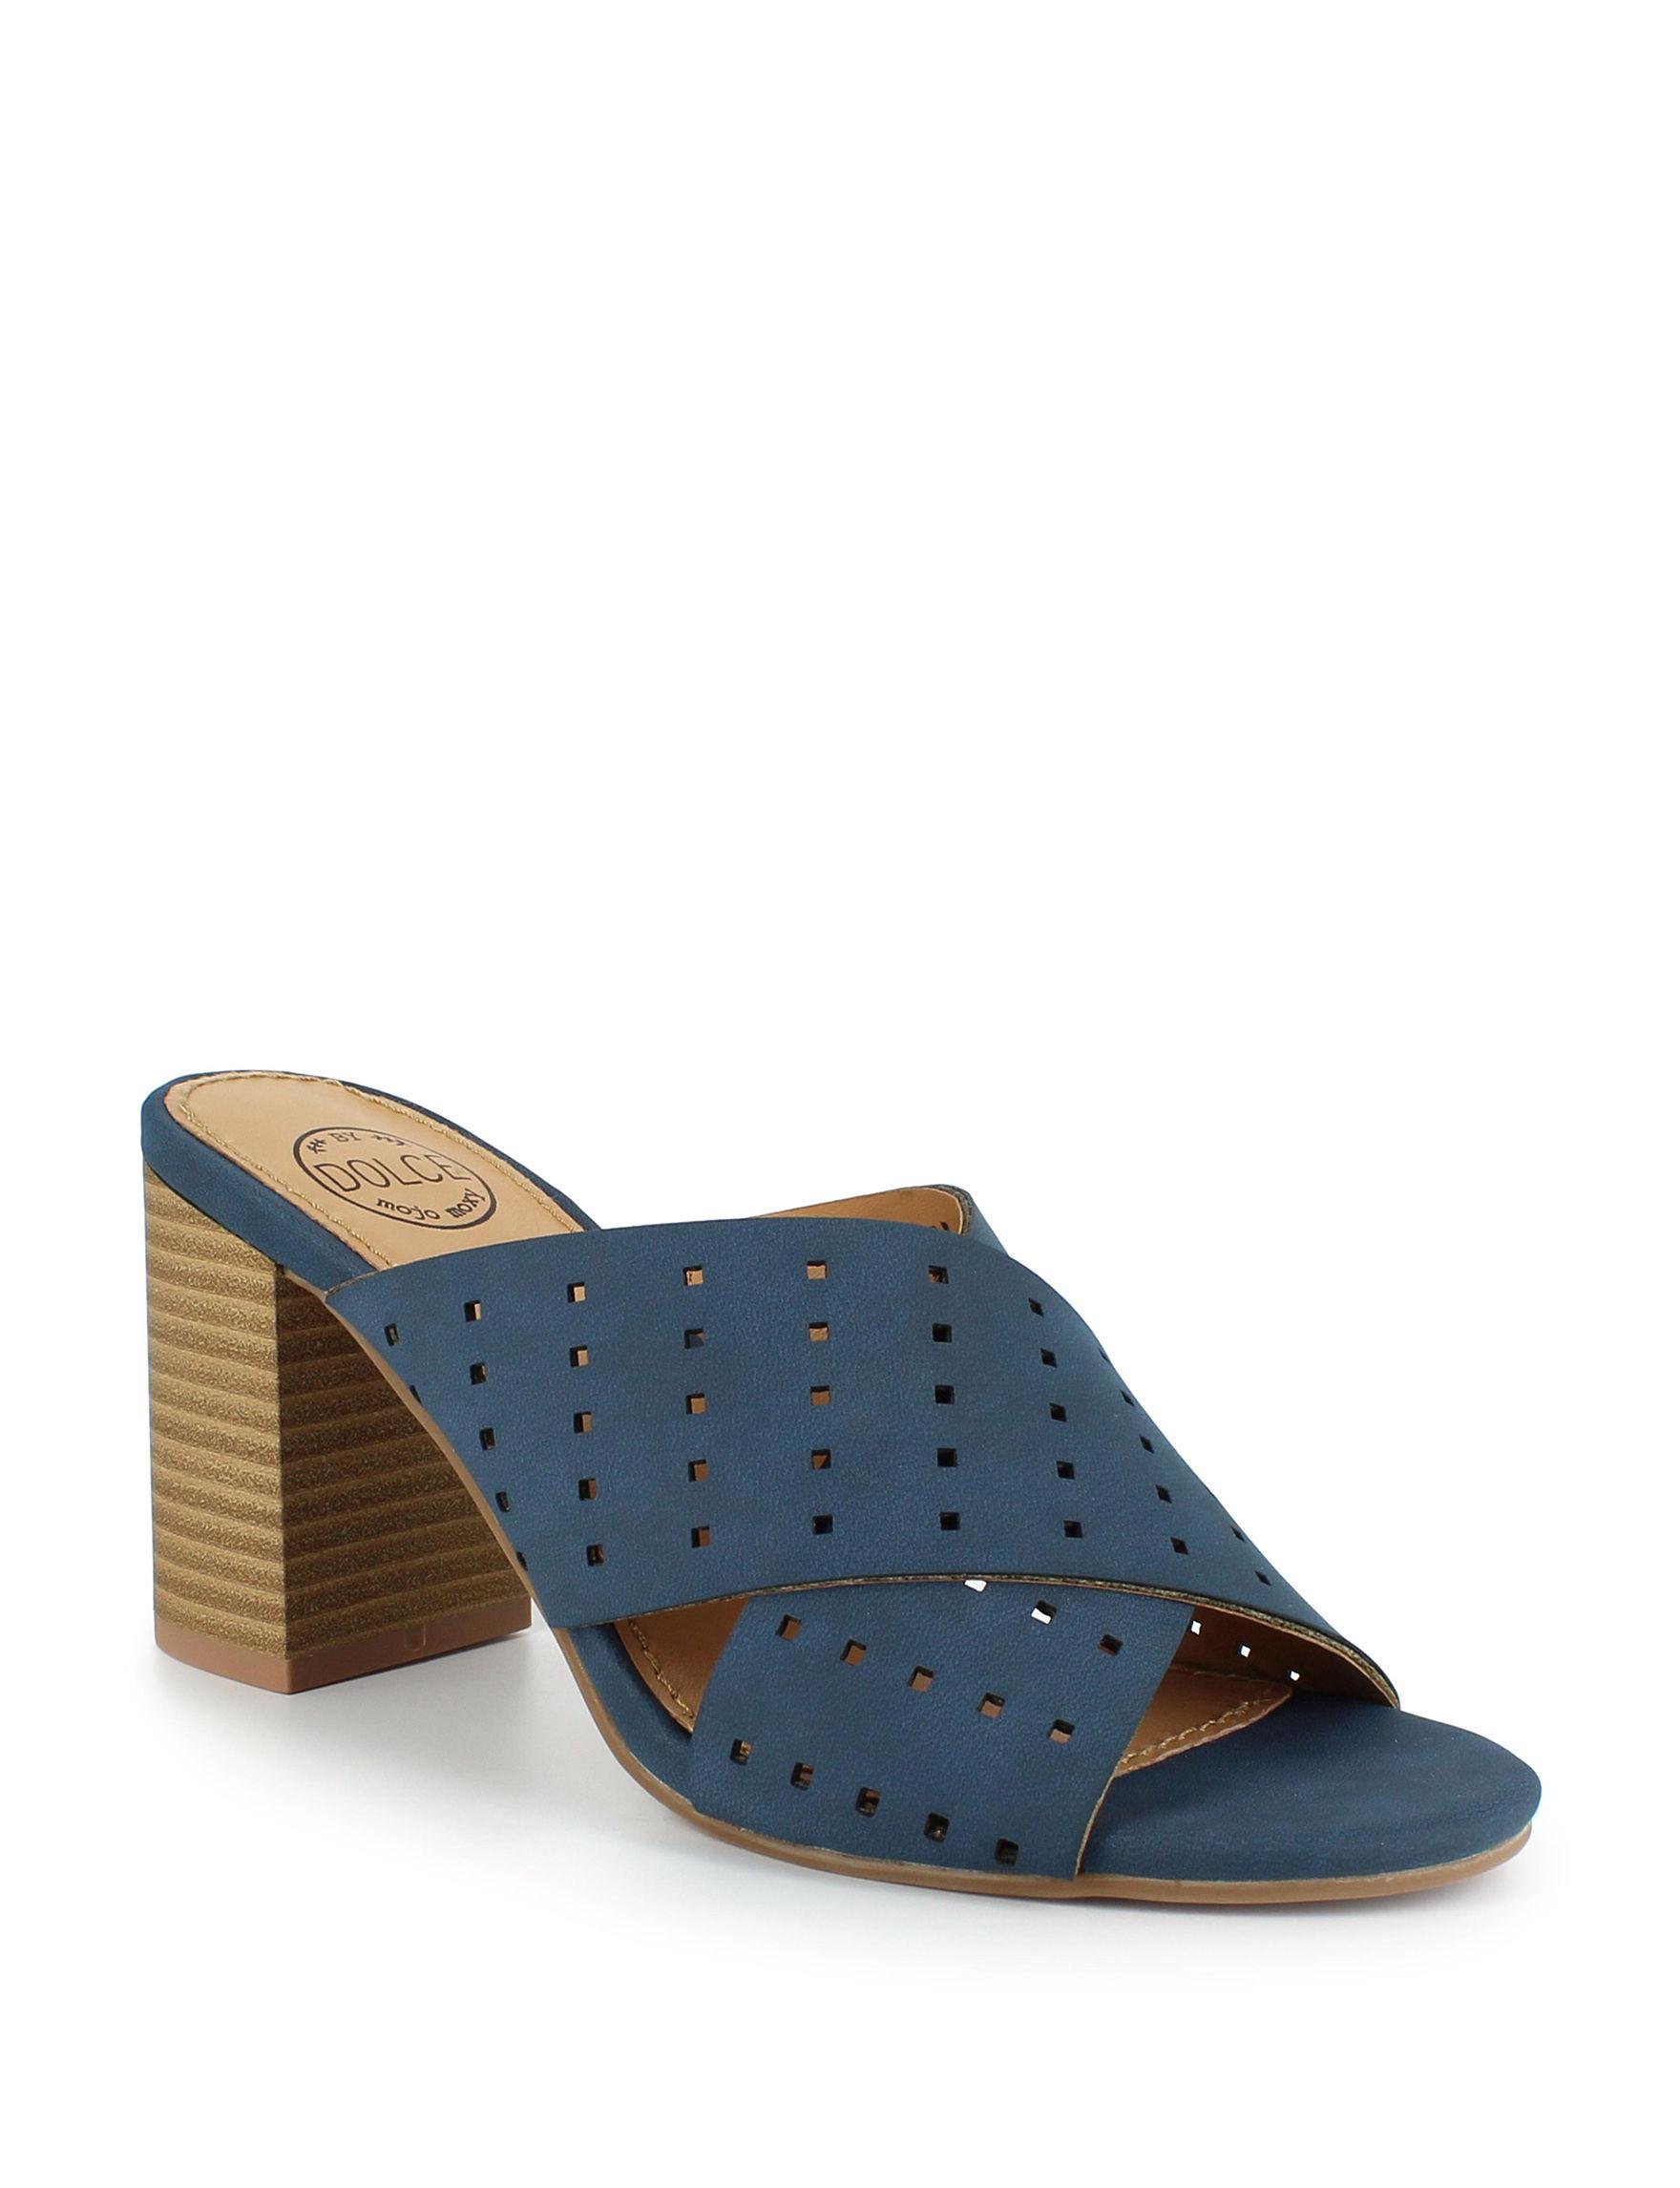 Dolce by Mojo Moxy Indigo Heeled Sandals